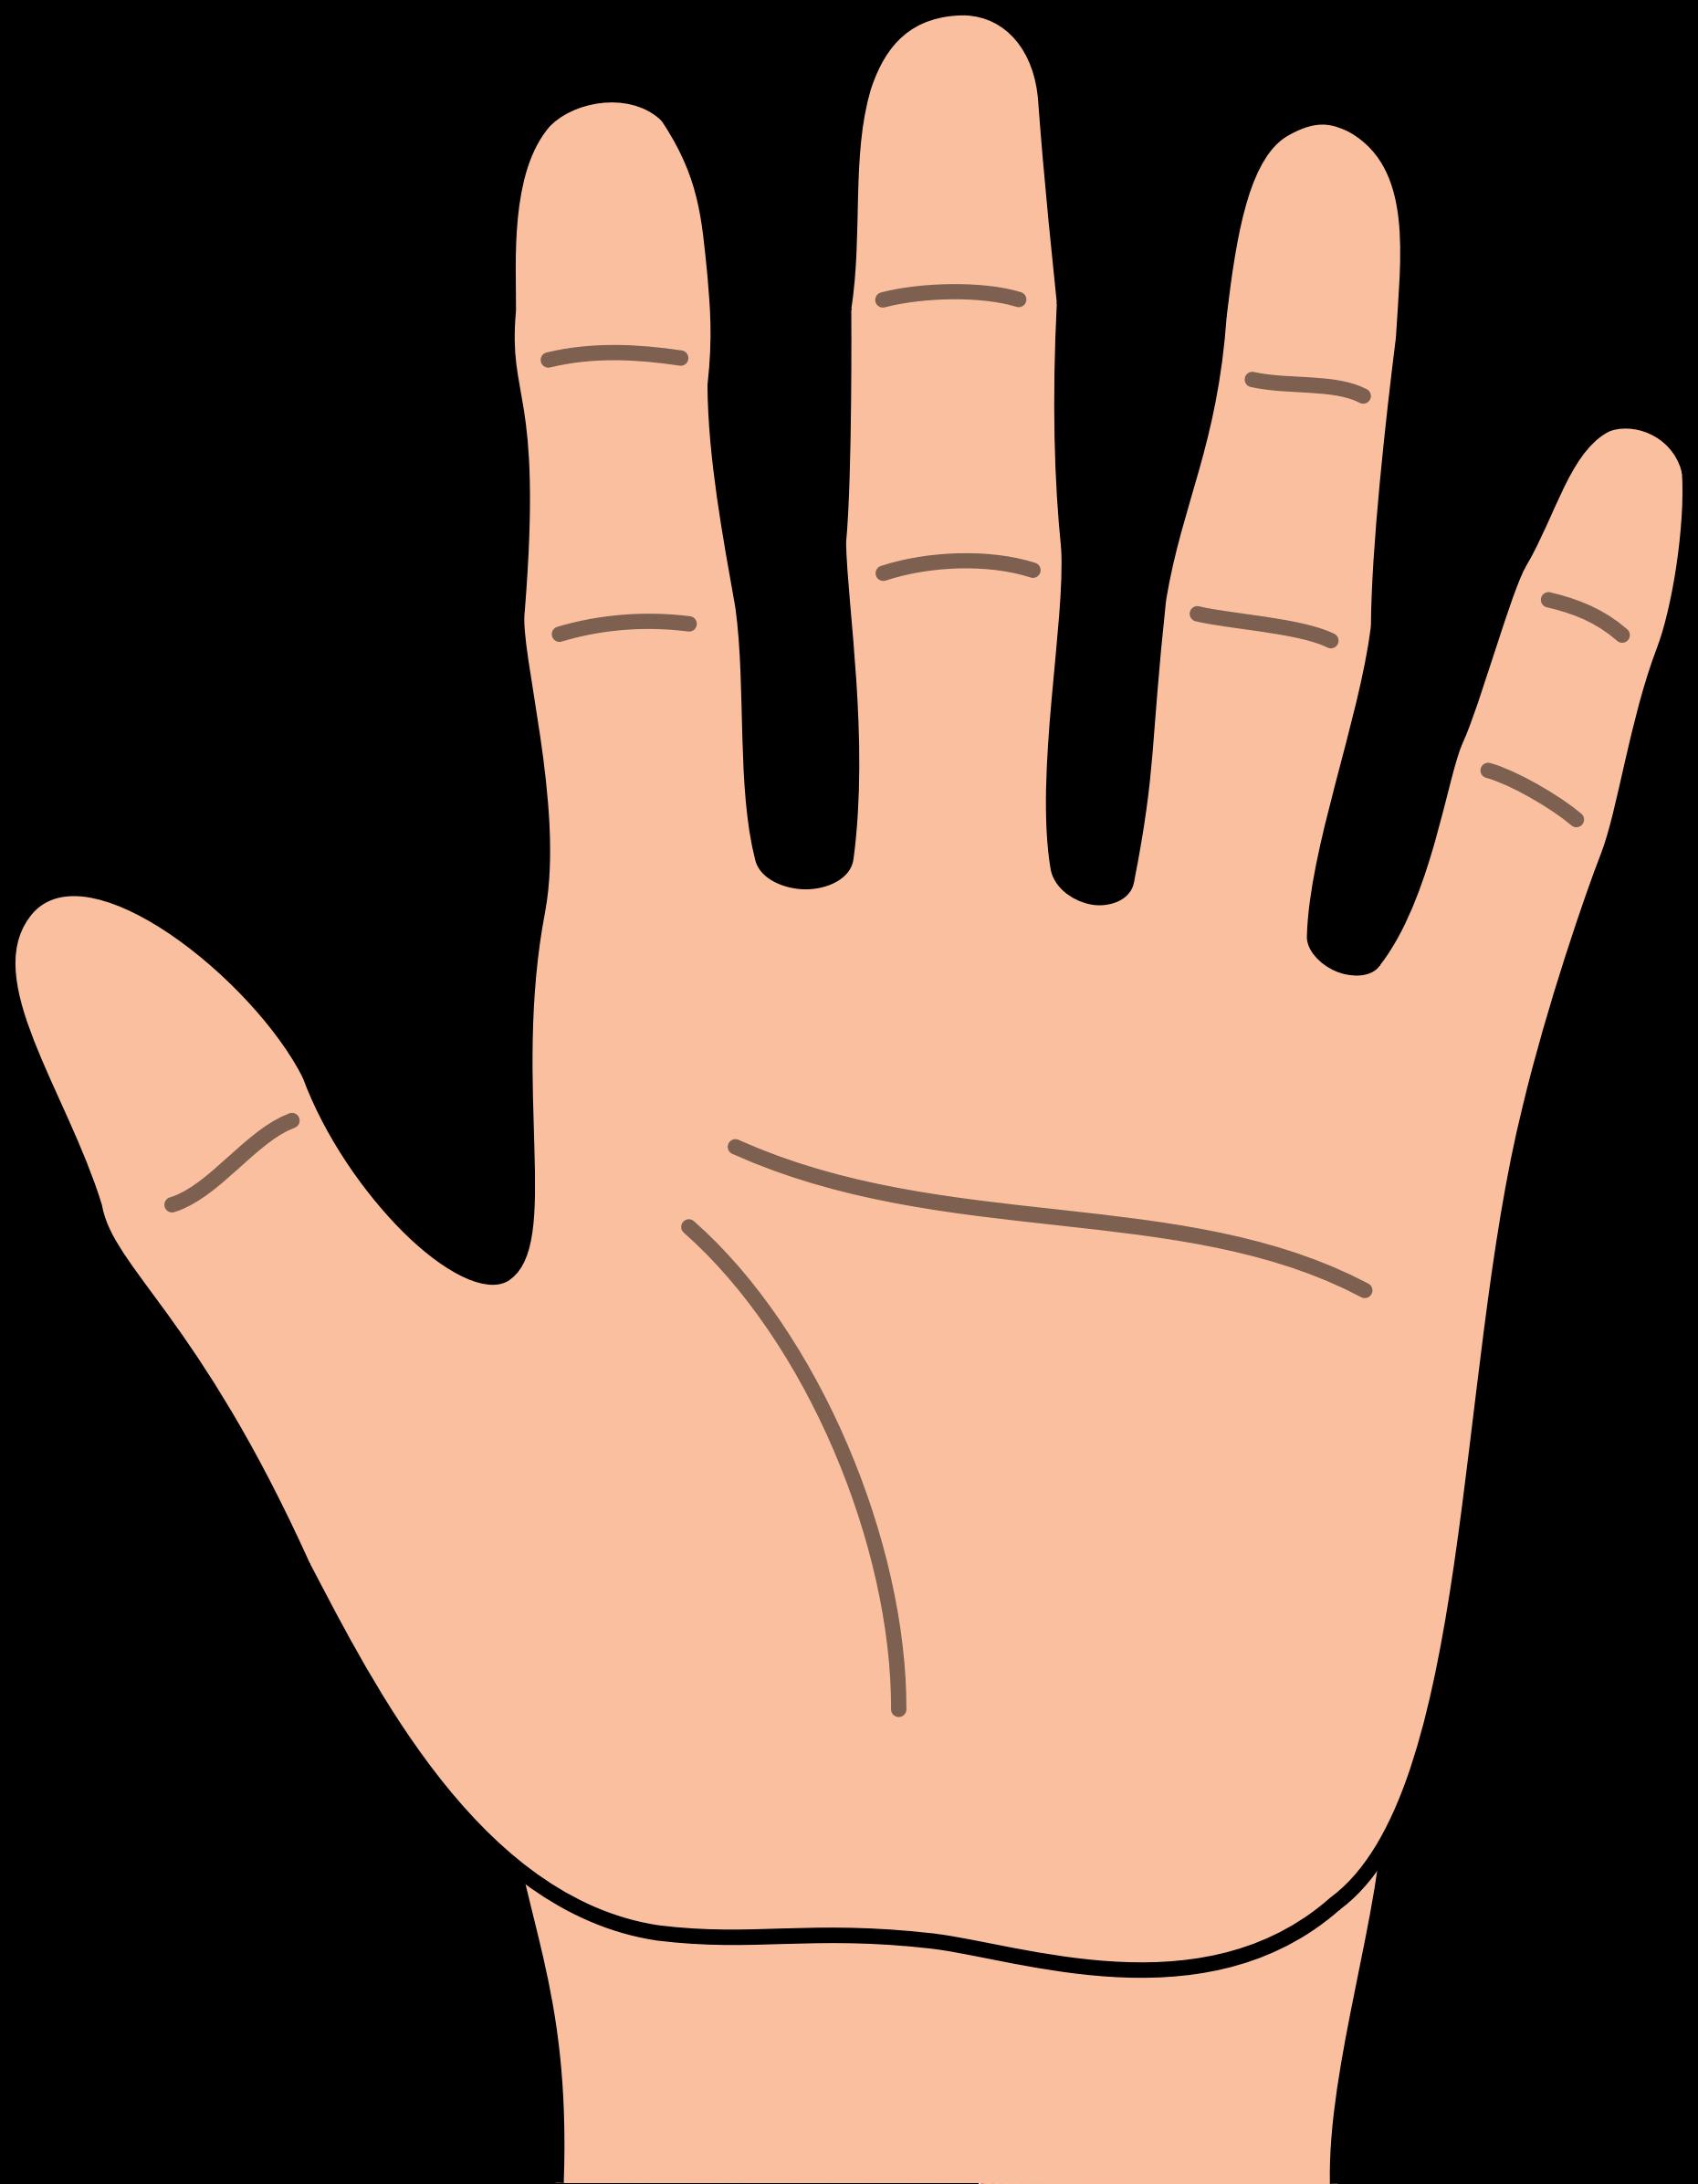 Hand clipart Clip Free Art Clipart hand%20clipart